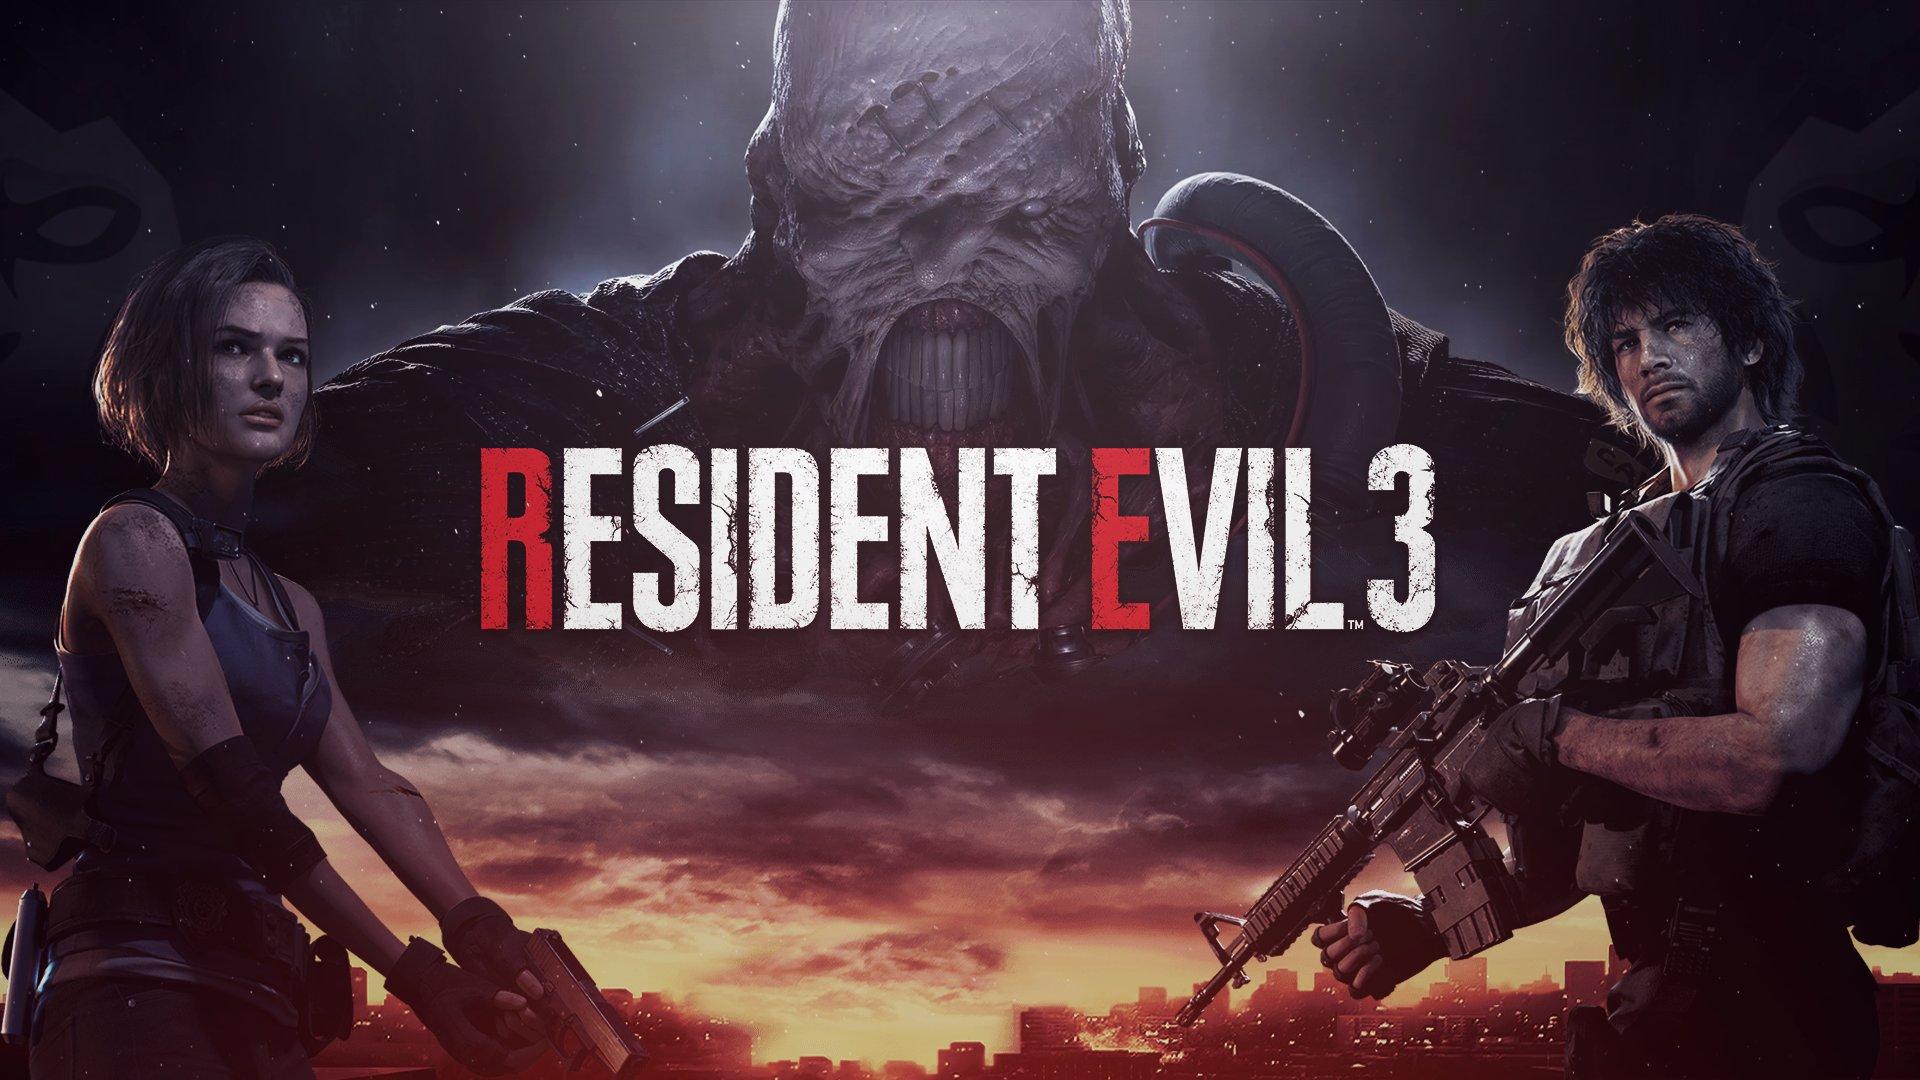 Вышел патч для демоверсии Resident Evil 3 Remake